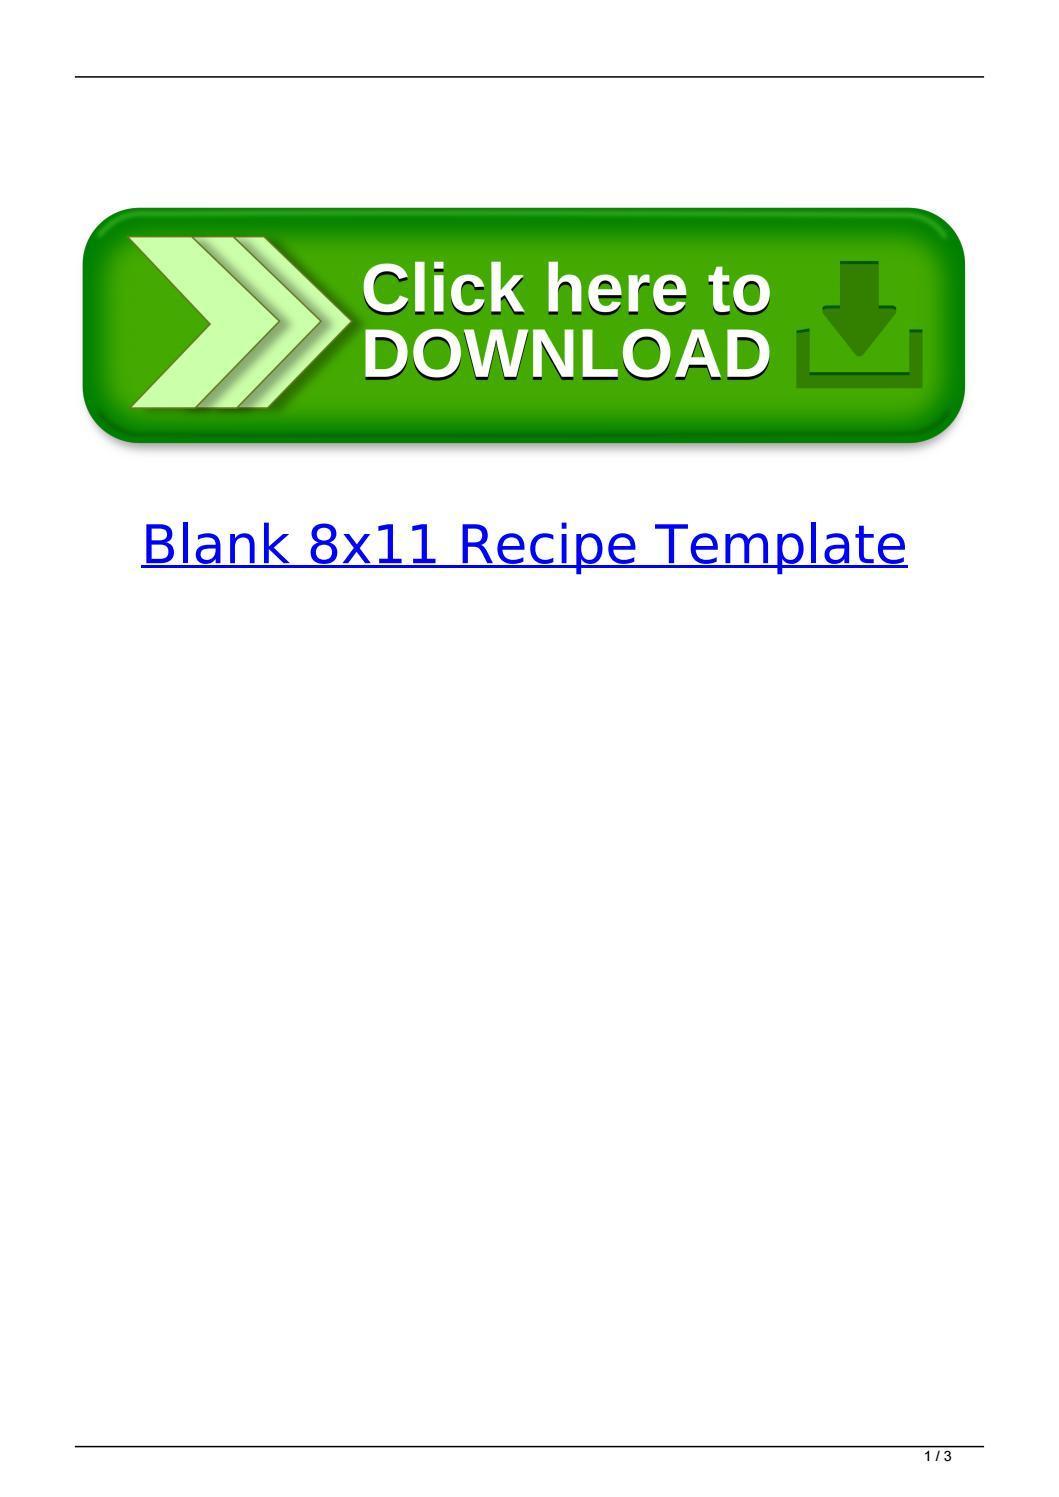 Blank Recipe Template 8x11